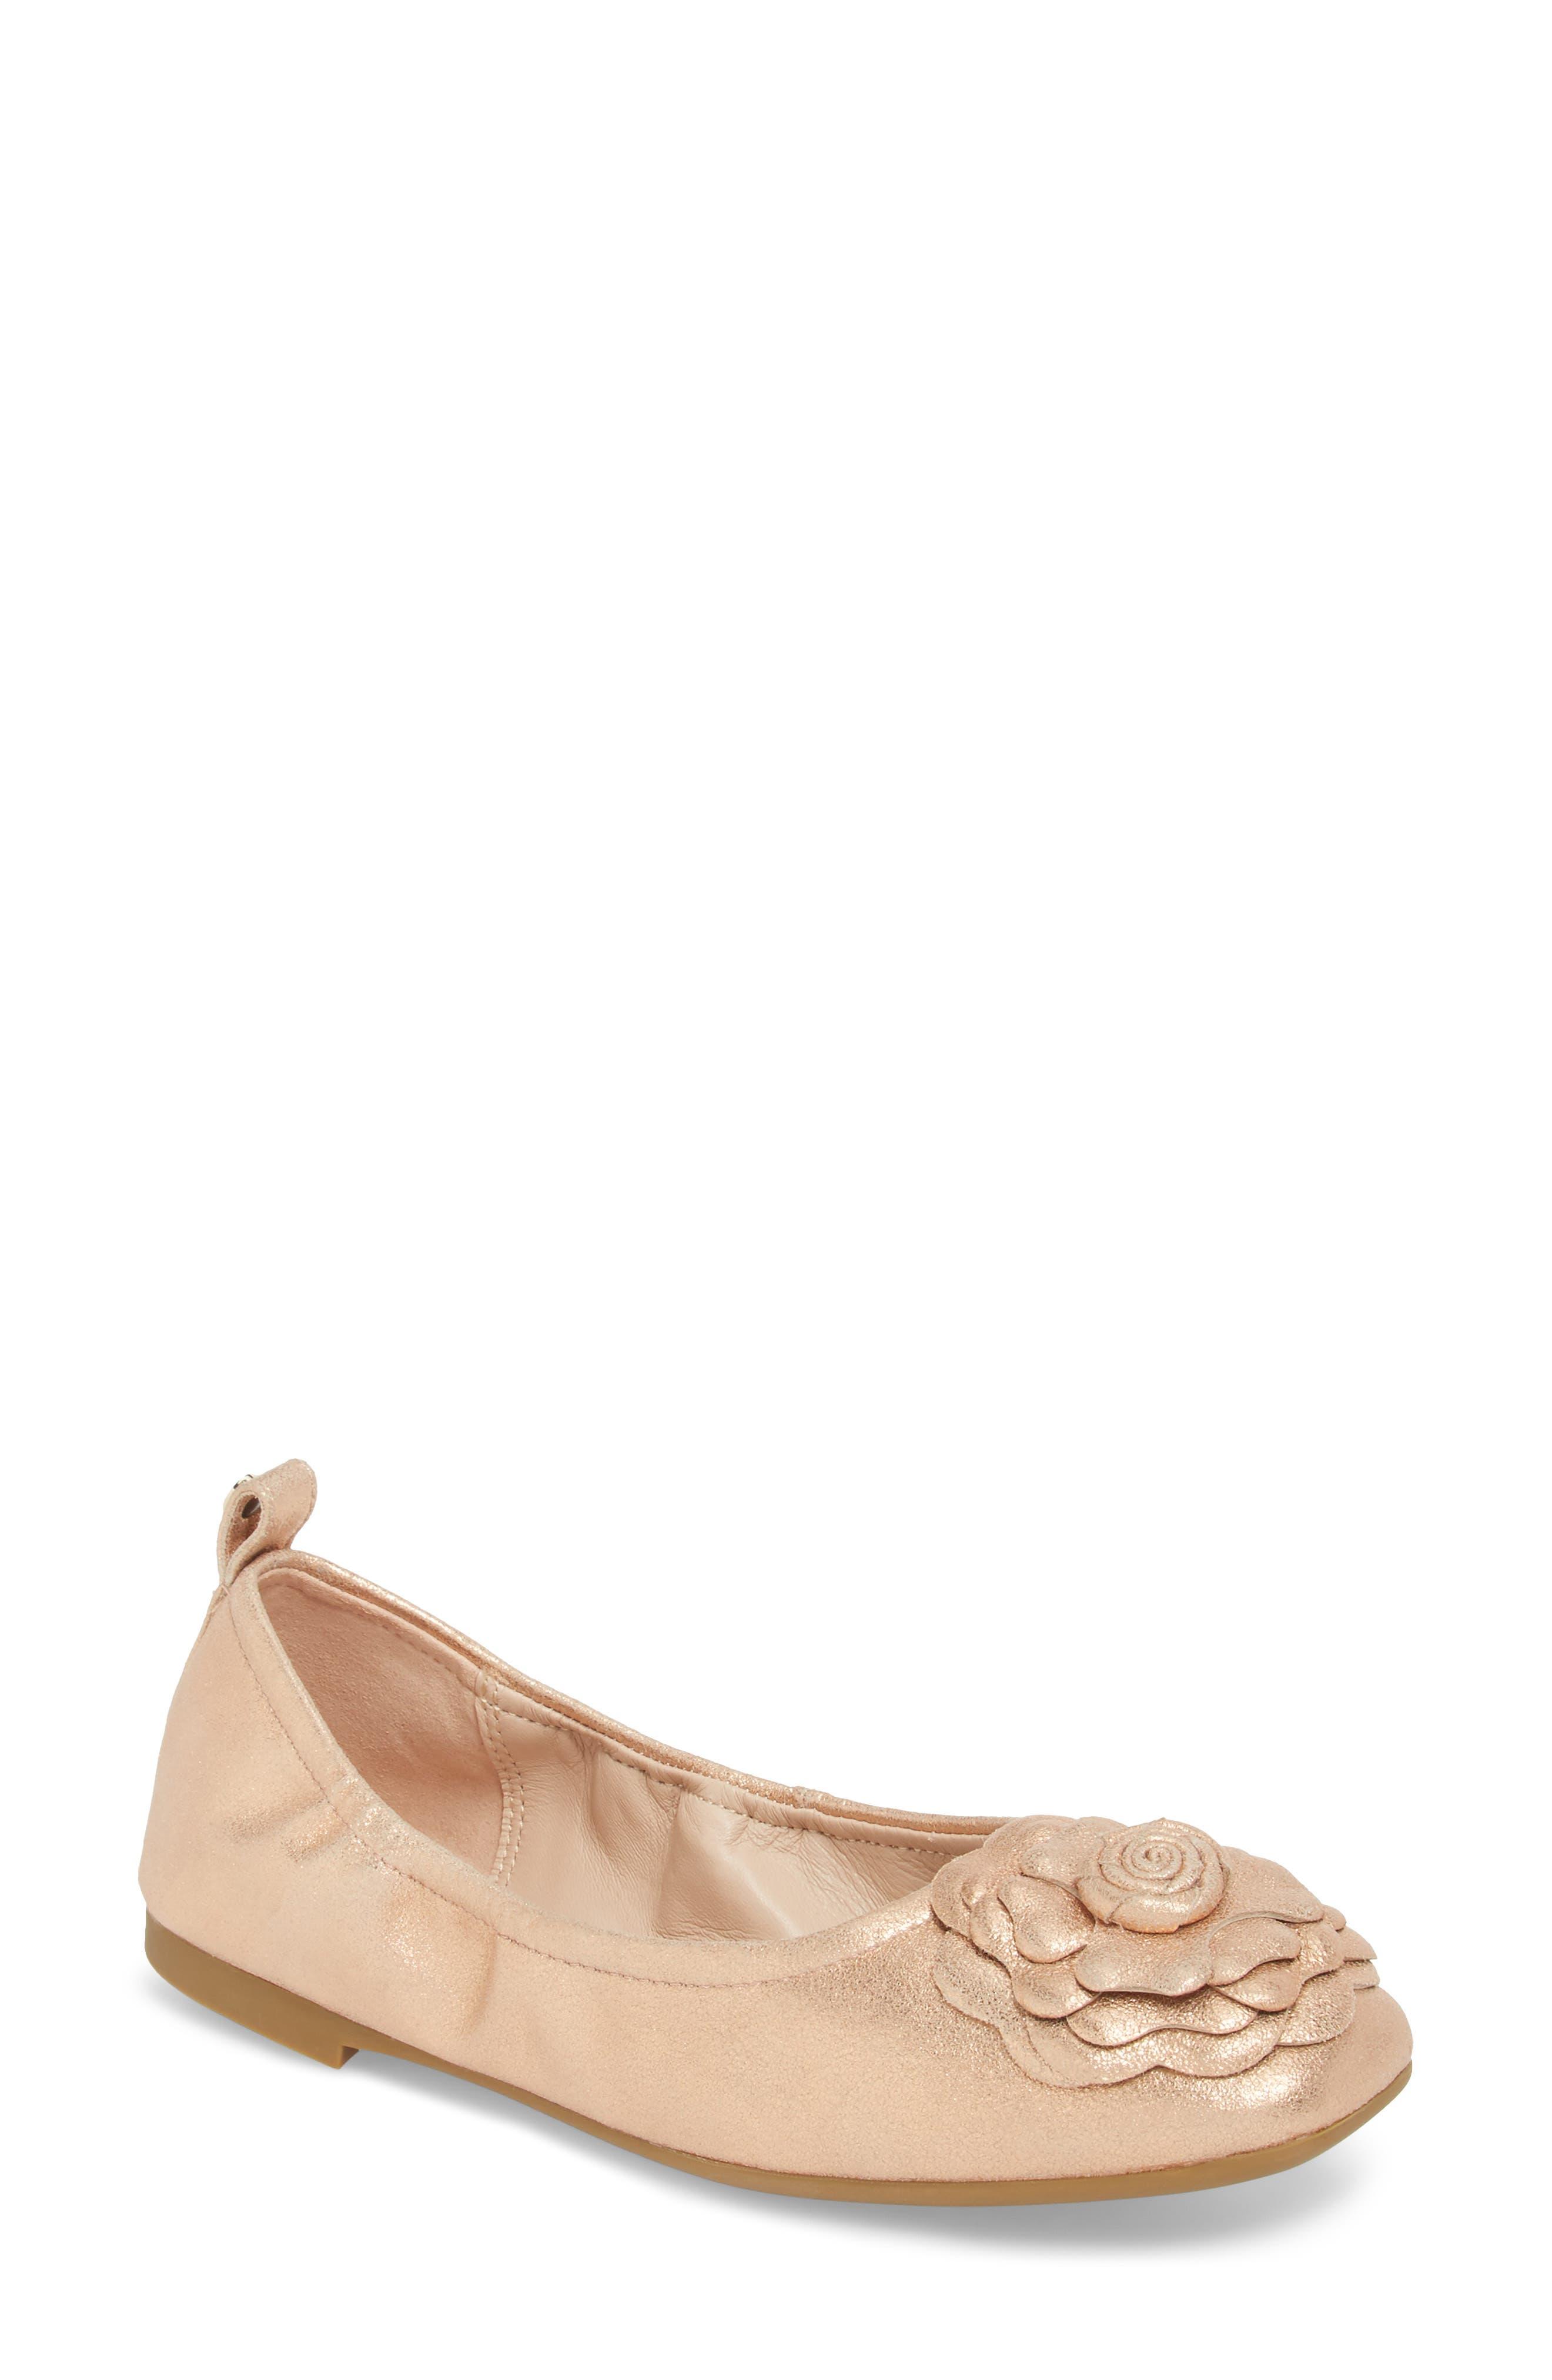 Rosalyn Ballet Flat,                         Main,                         color, Rose Gold Leather